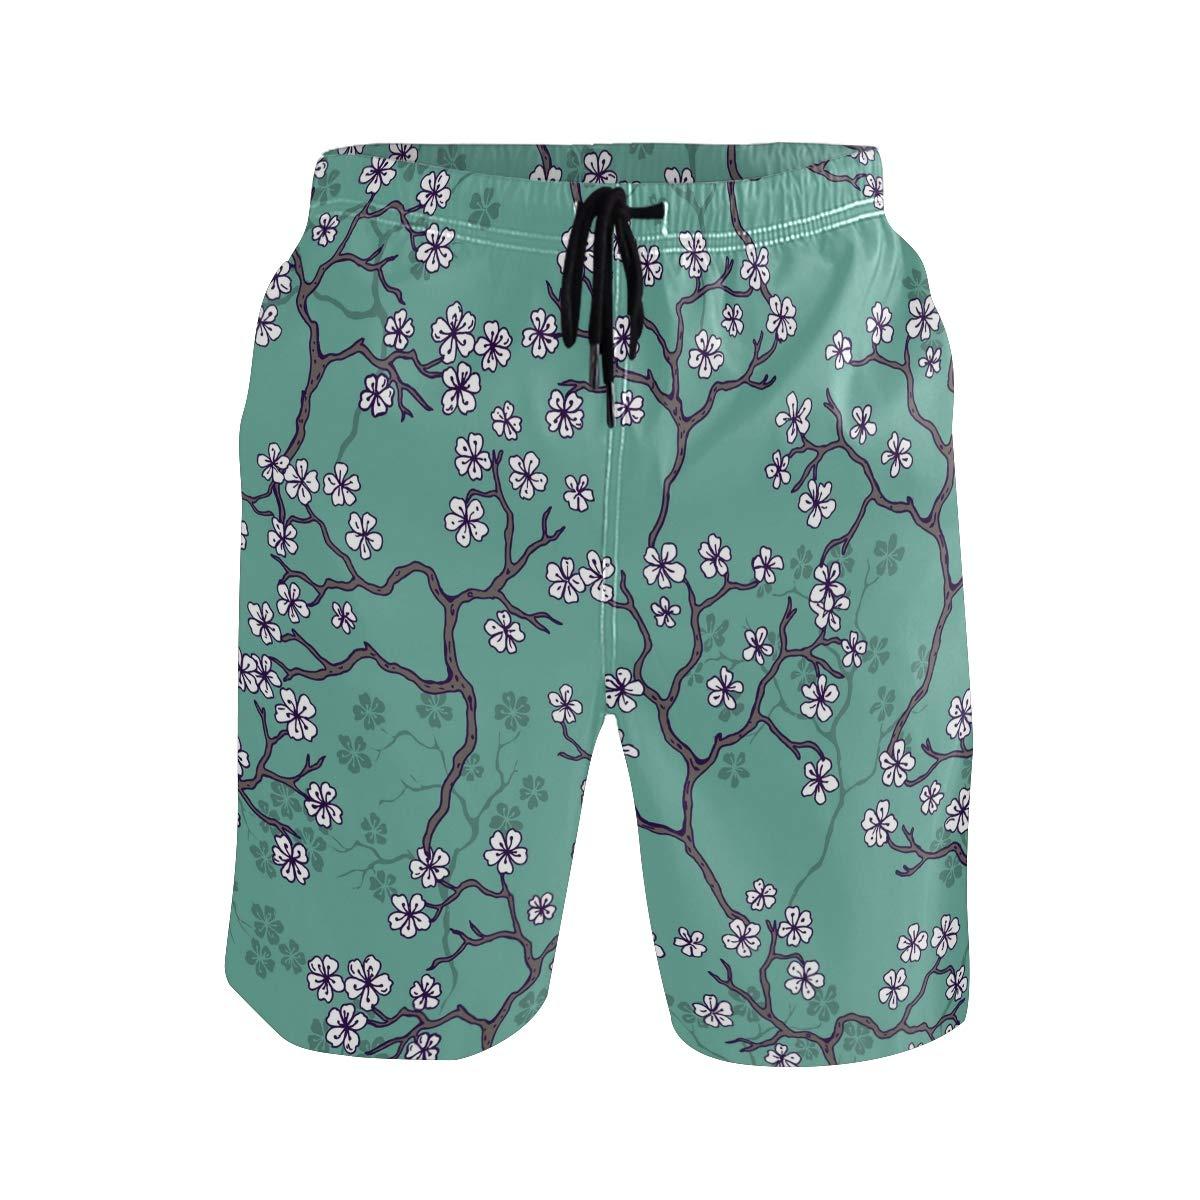 KUWT Mens Swim Trunks Japanese Sakura Cherry Blossom Quick Dry Beach Shorts Summer Surf Board Shorts